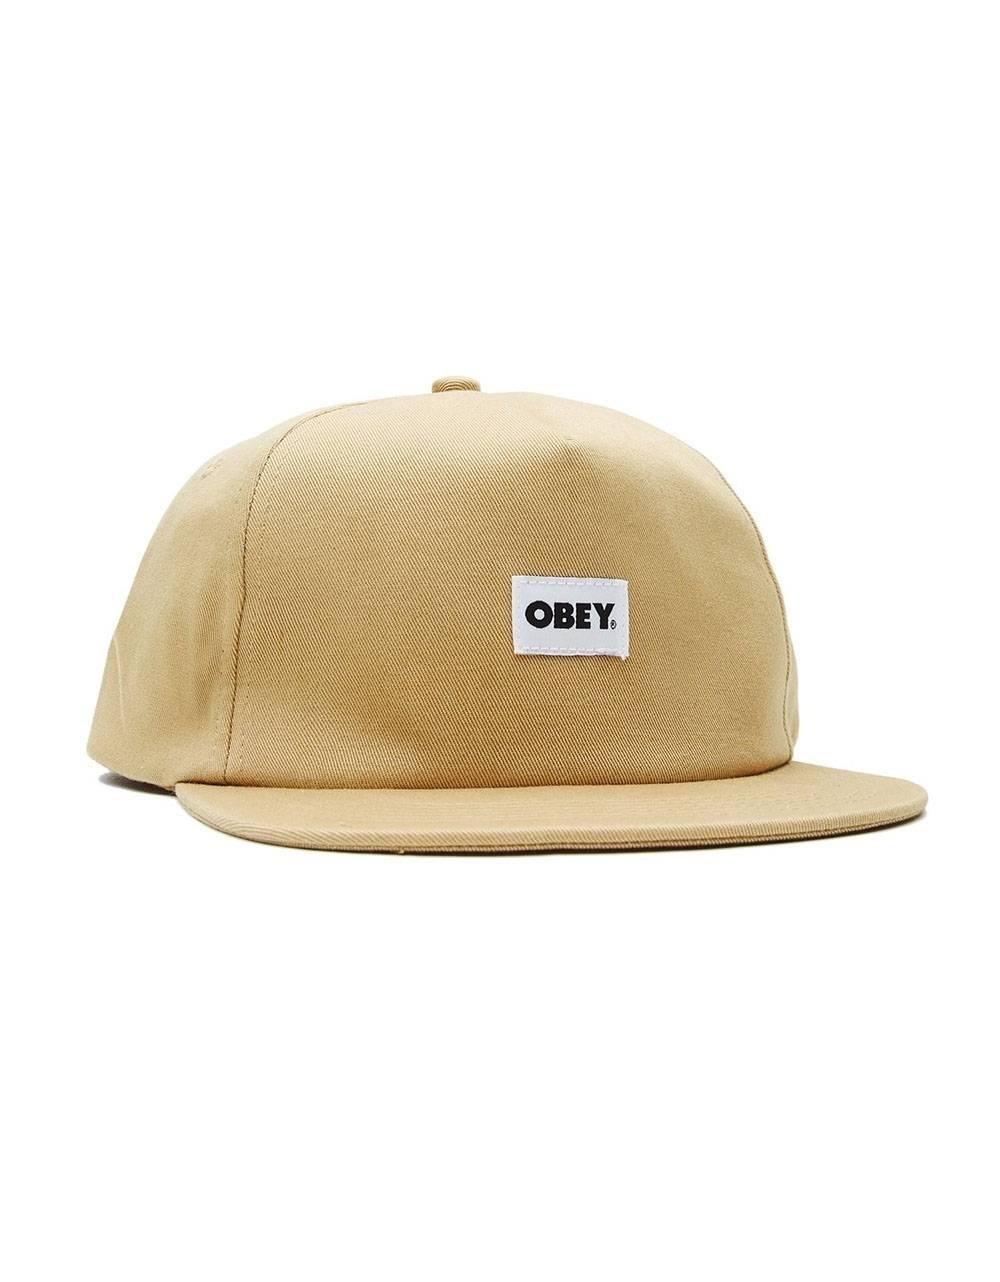 Obey bold label 6 panel strapback hat - almond obey Hat 45,00€